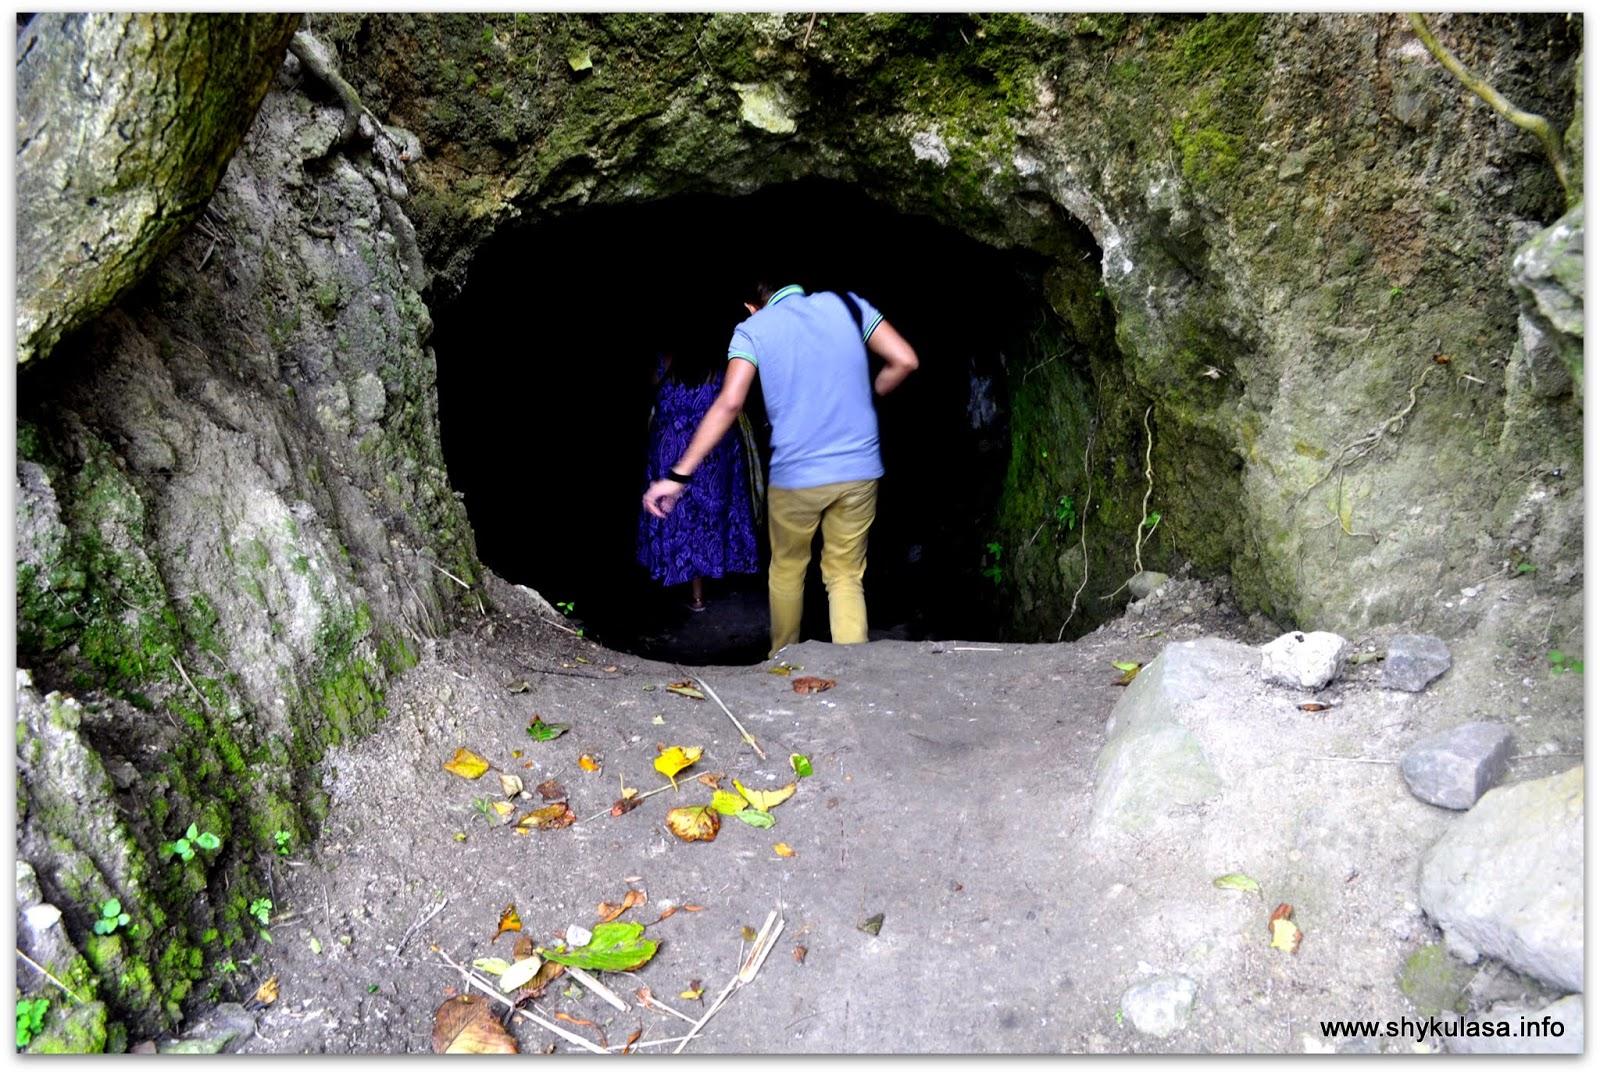 Dipnaysupuan Japanese Tunnel, Batanes